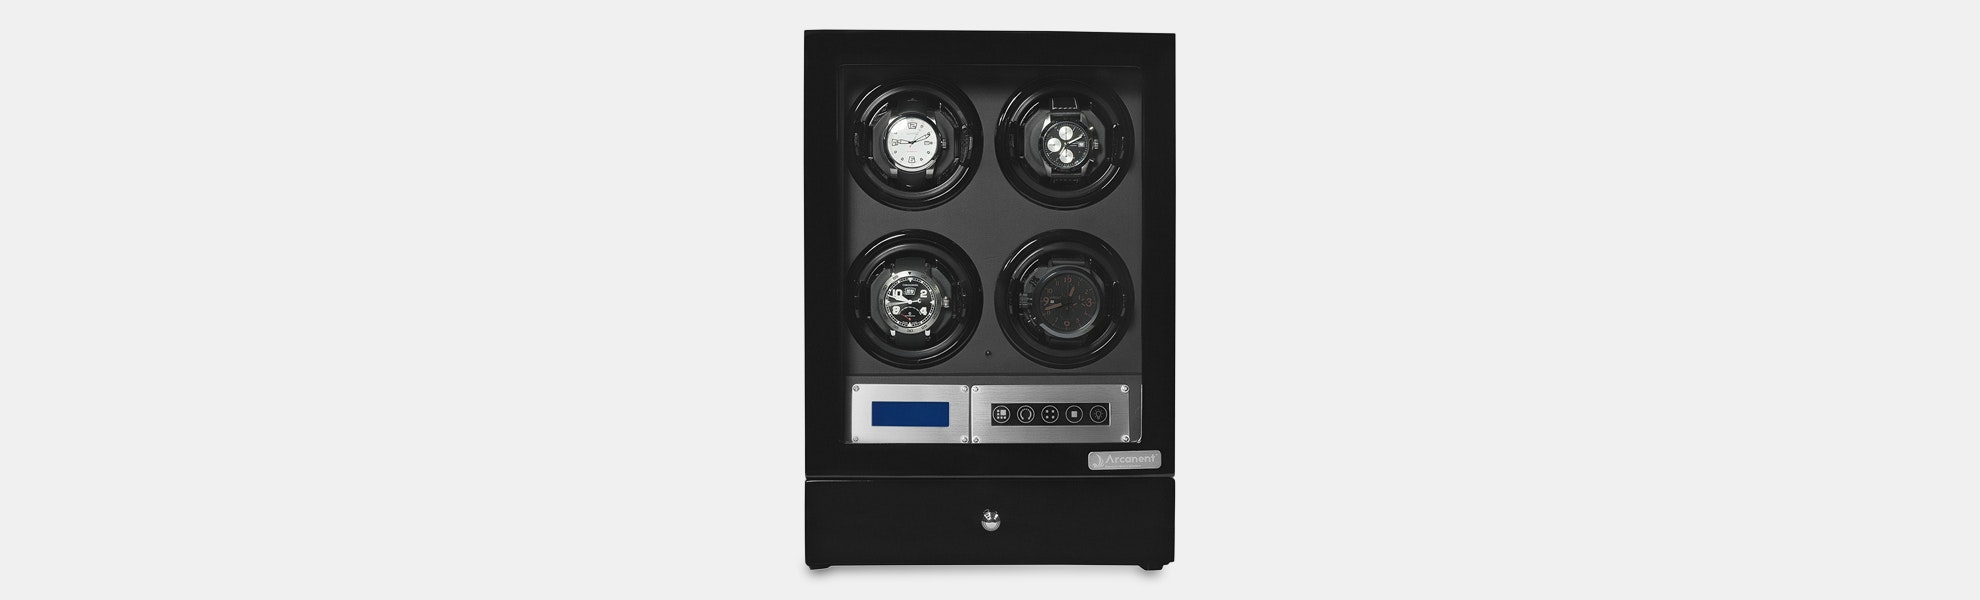 Arcanent Premium Watch Winders